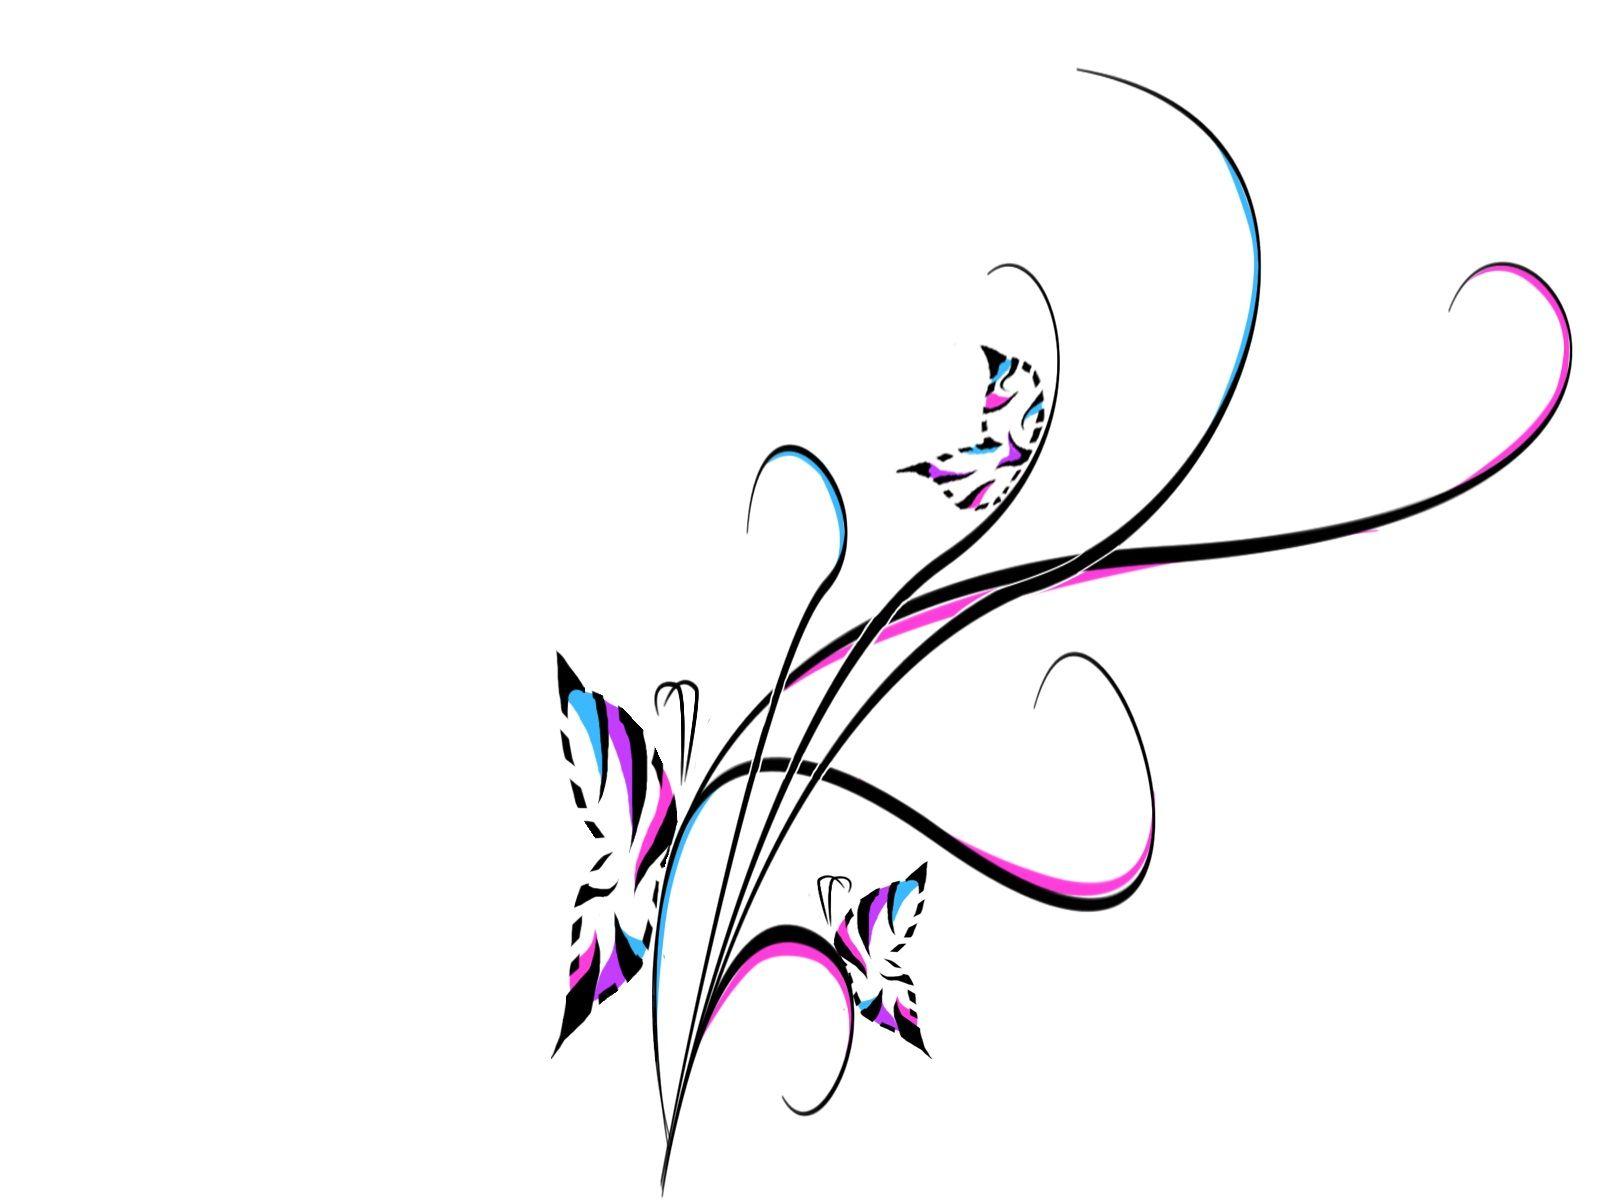 Abstract Swirl Tattoo Designs